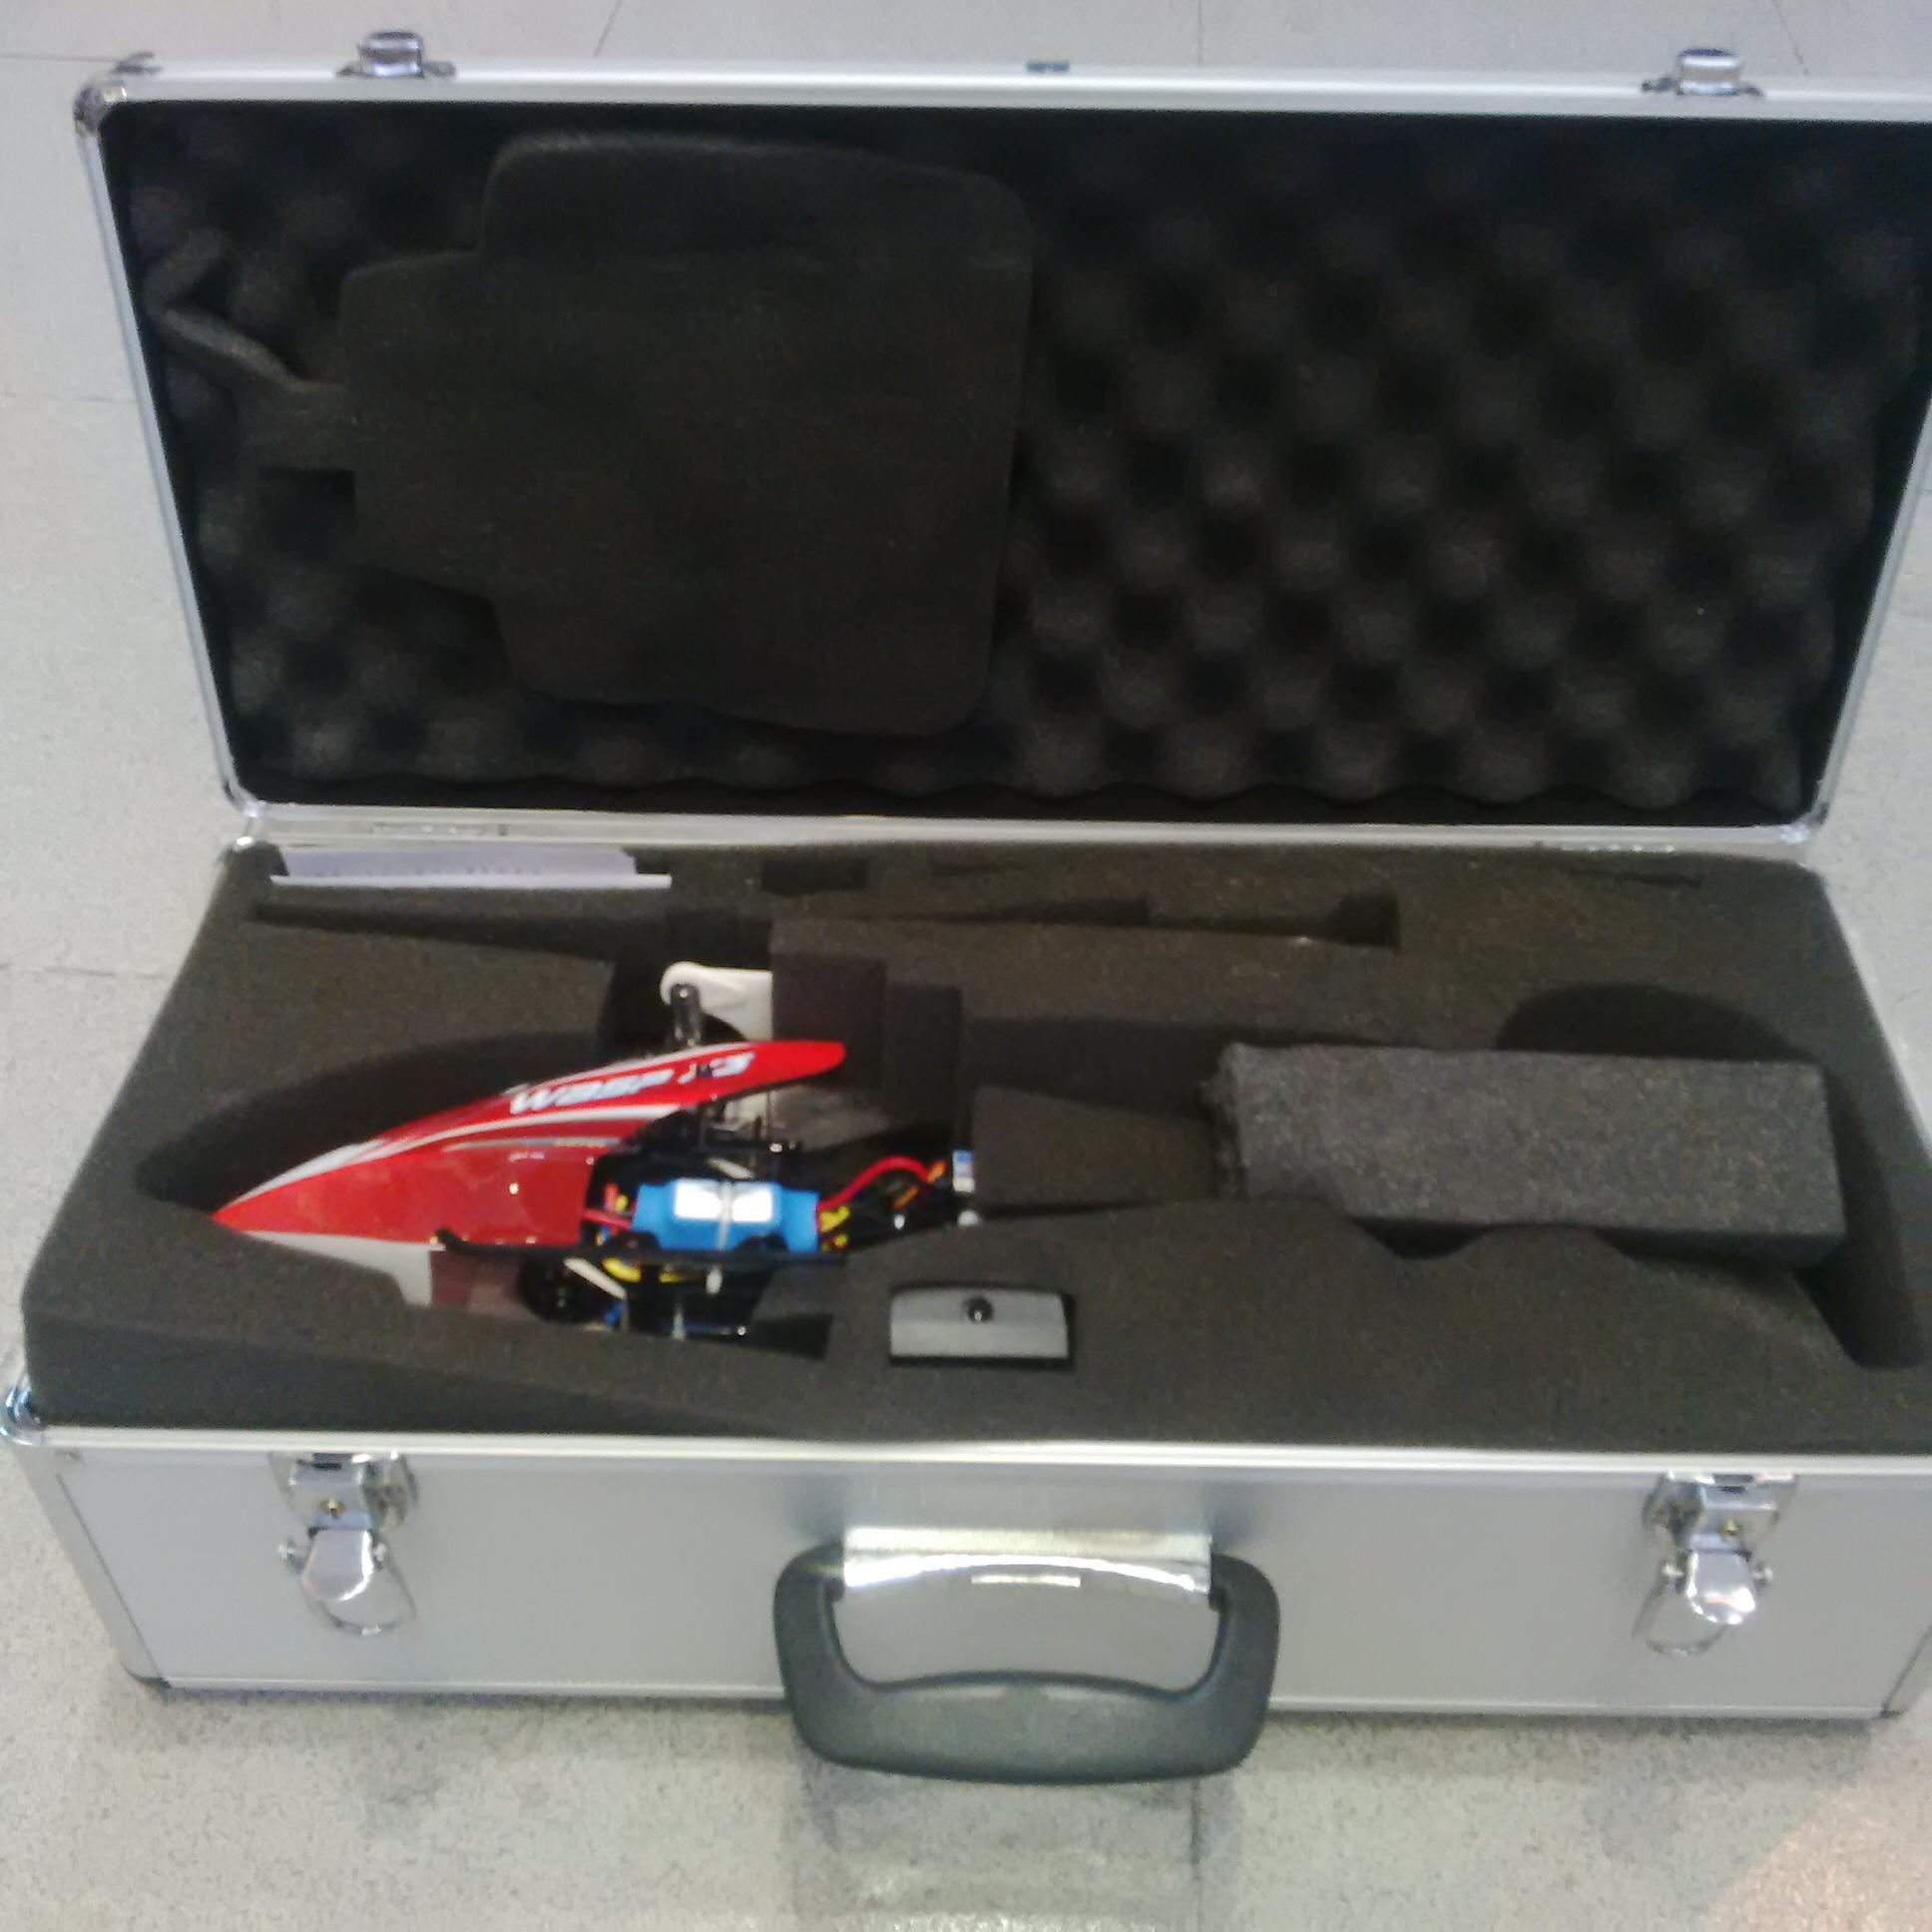 Skyartec Wasp x3v 6ch 3-AXIS Flybarless 2.4GHz RTF (Aluminium Case)